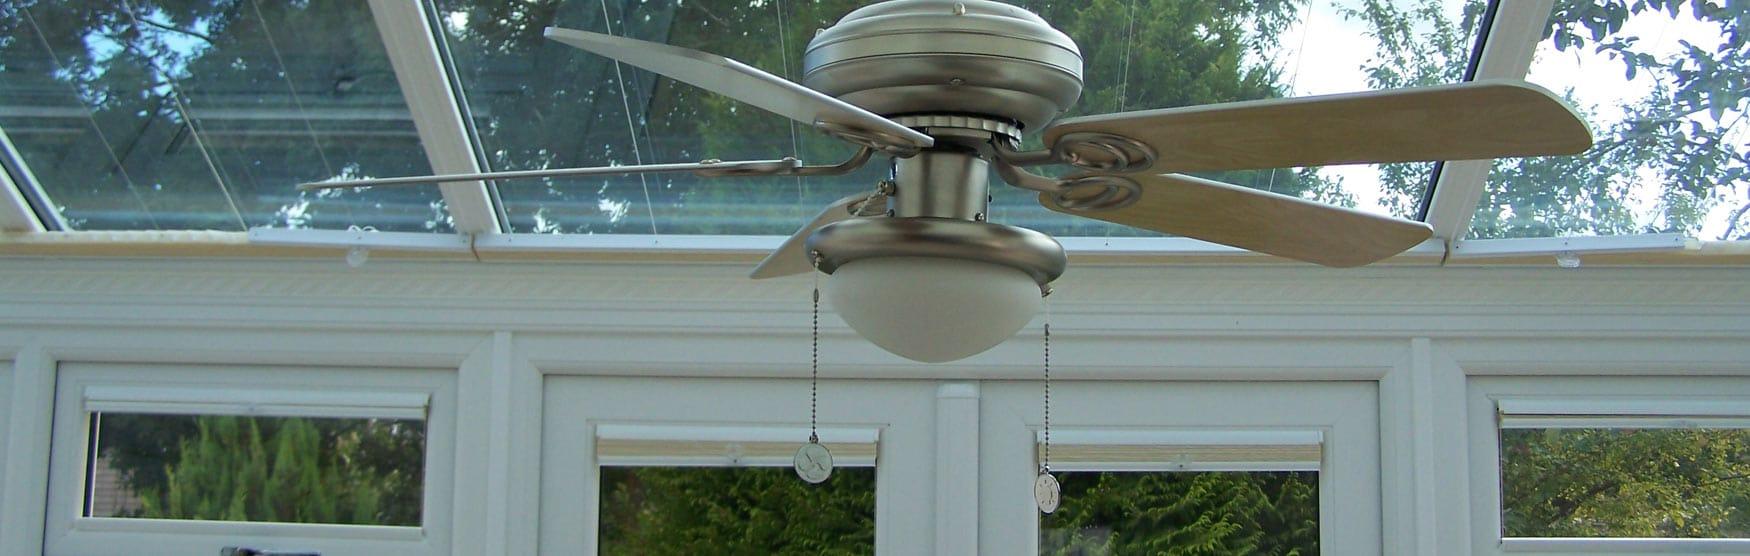 slider-conservatory-0018